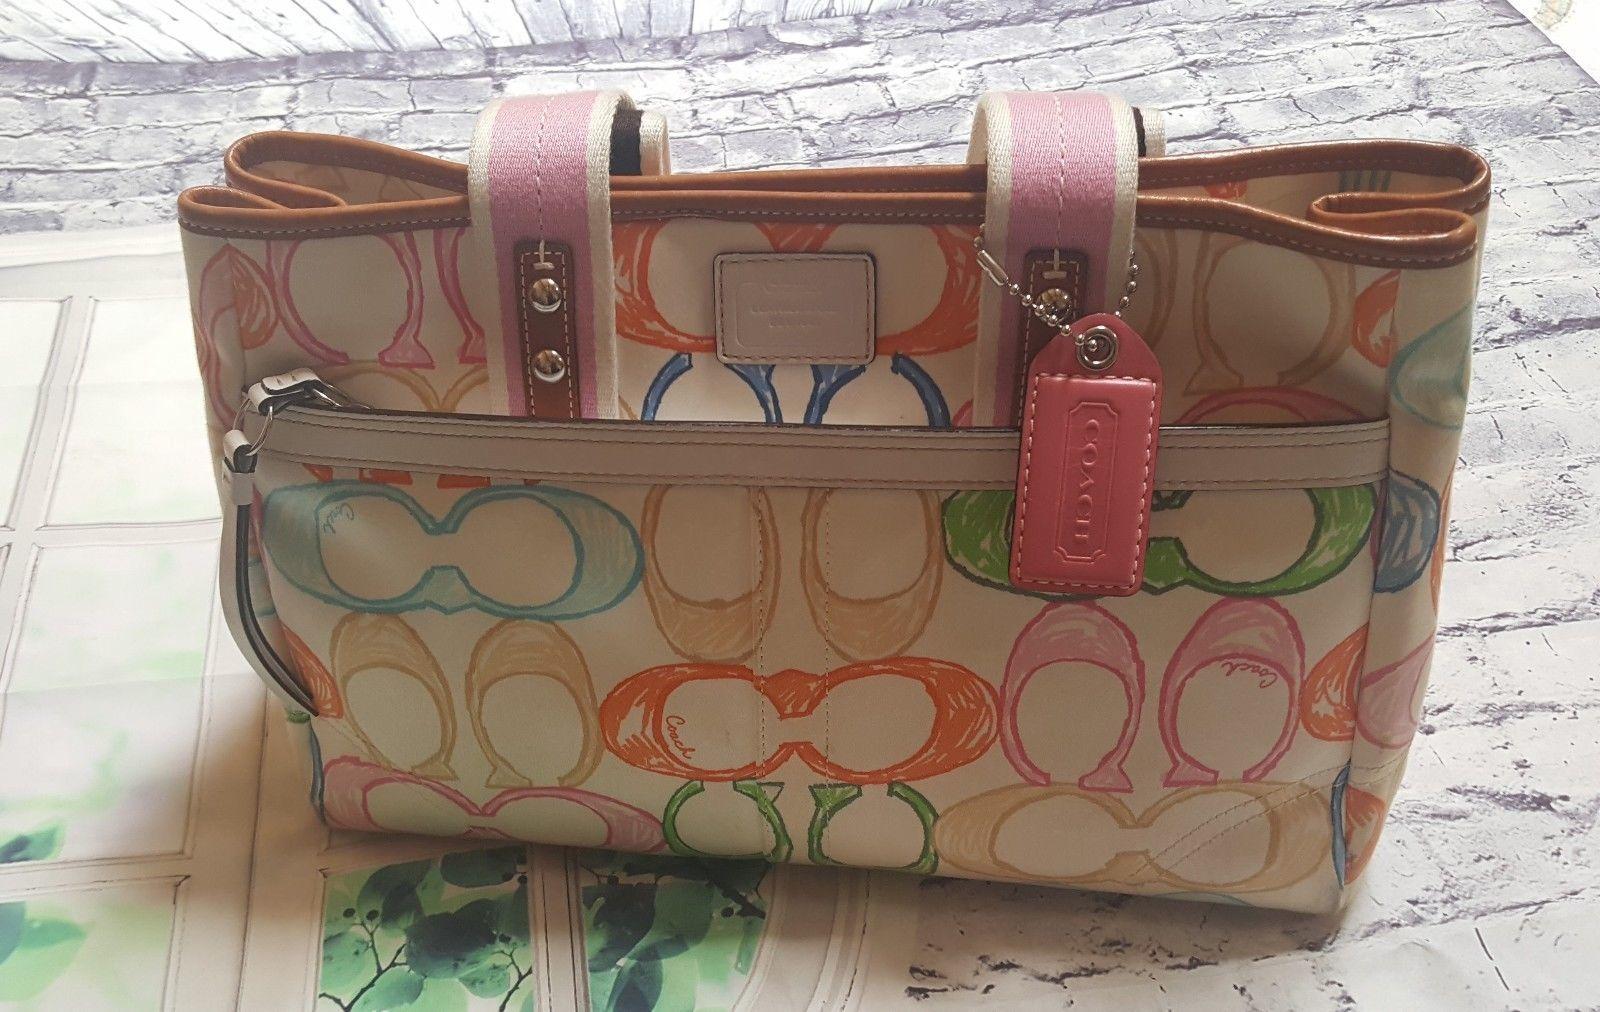 d59b5557dfb4d ... reusenation 89473 b0fc9 free shipping coach scribble hamptons 10674  tote handbag 69.99 923e0 47746 ...